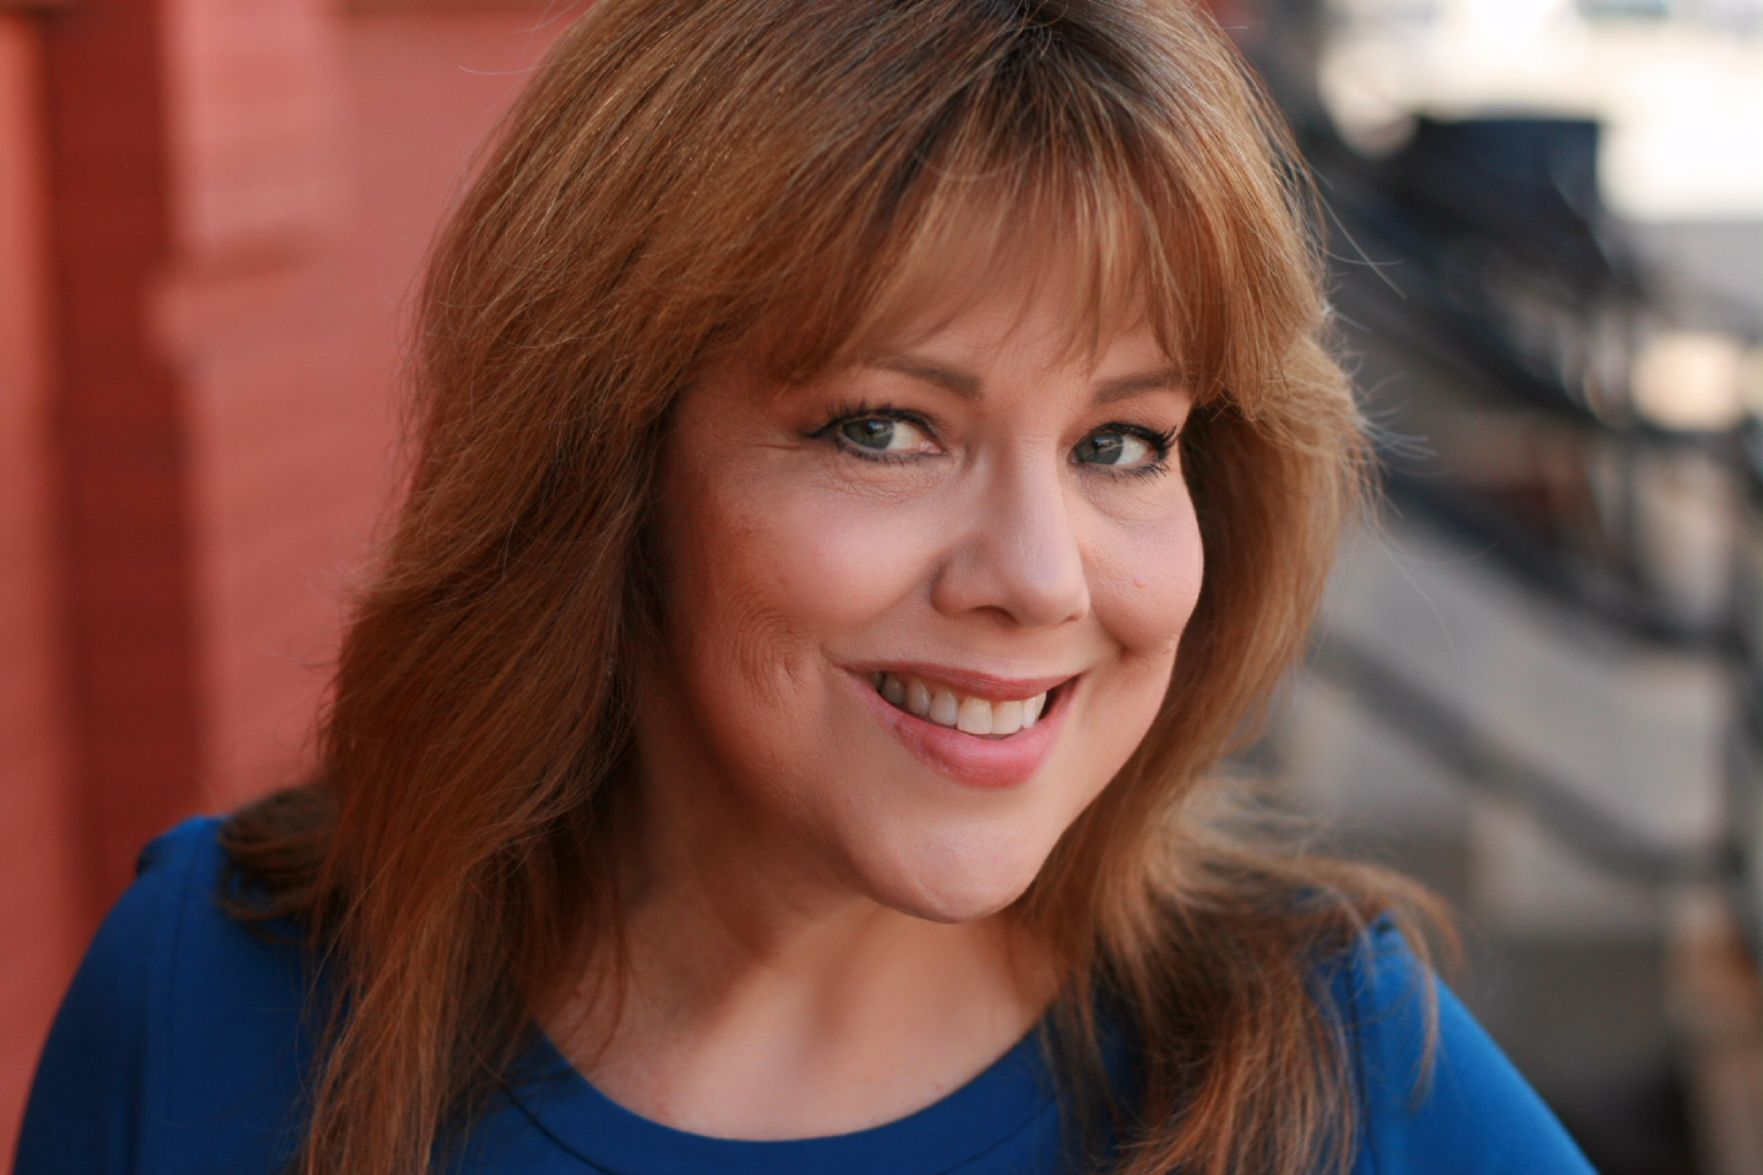 Watch Elaine Lee (actress) video